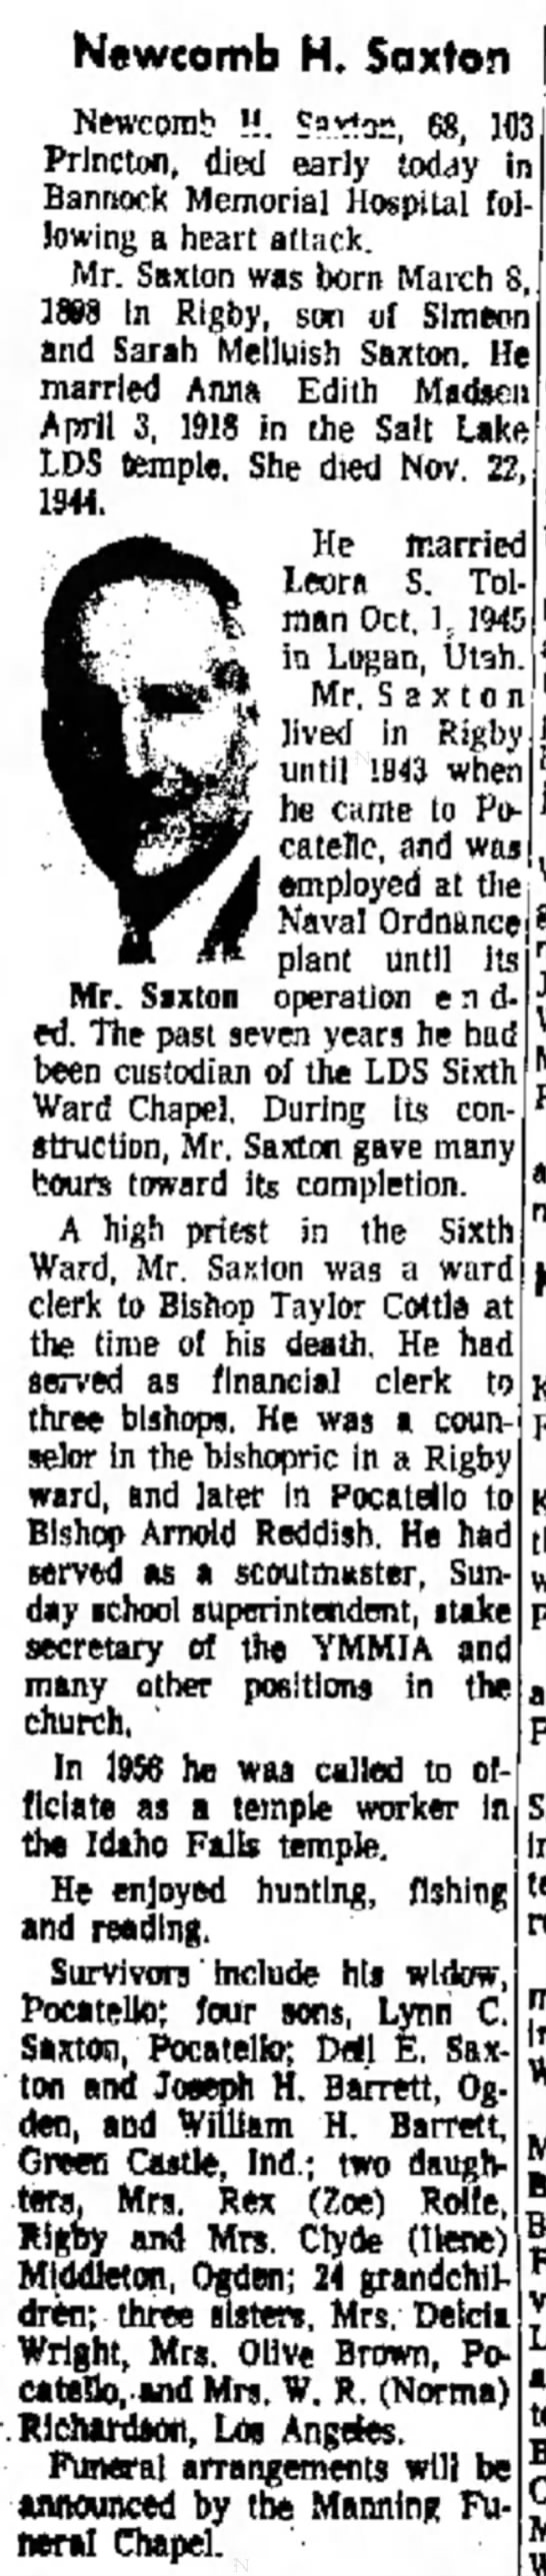 Obituary of Newcomb H. Saxton (1898-1966) - Newcomb H. Saxton Newcom!? H. Sixt3=, 68, N...